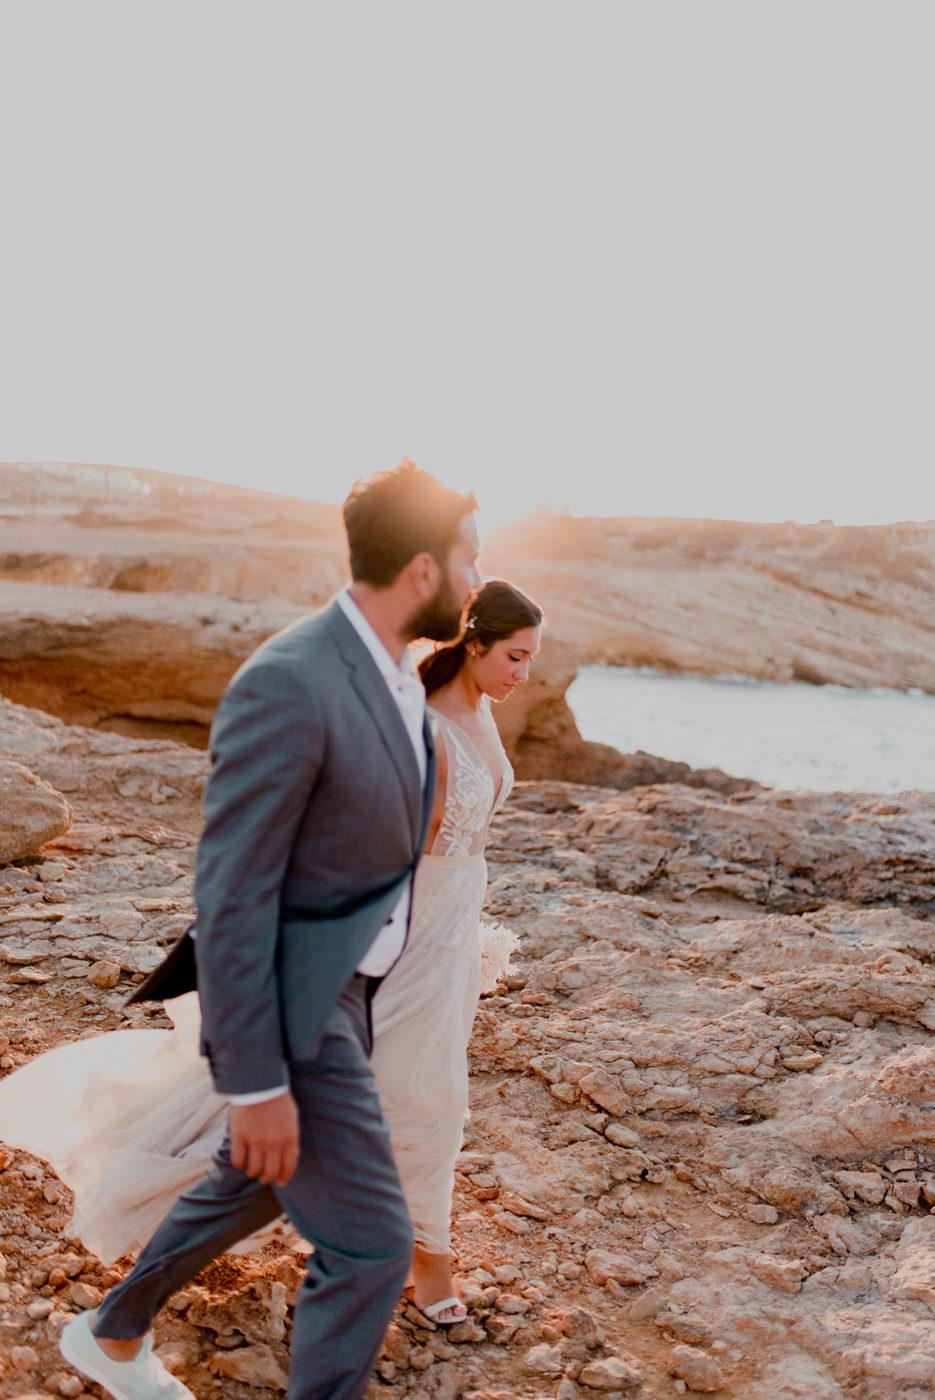 kirill-samarits-wedding-photography-koufonisia-greece-couple-photographer (27)